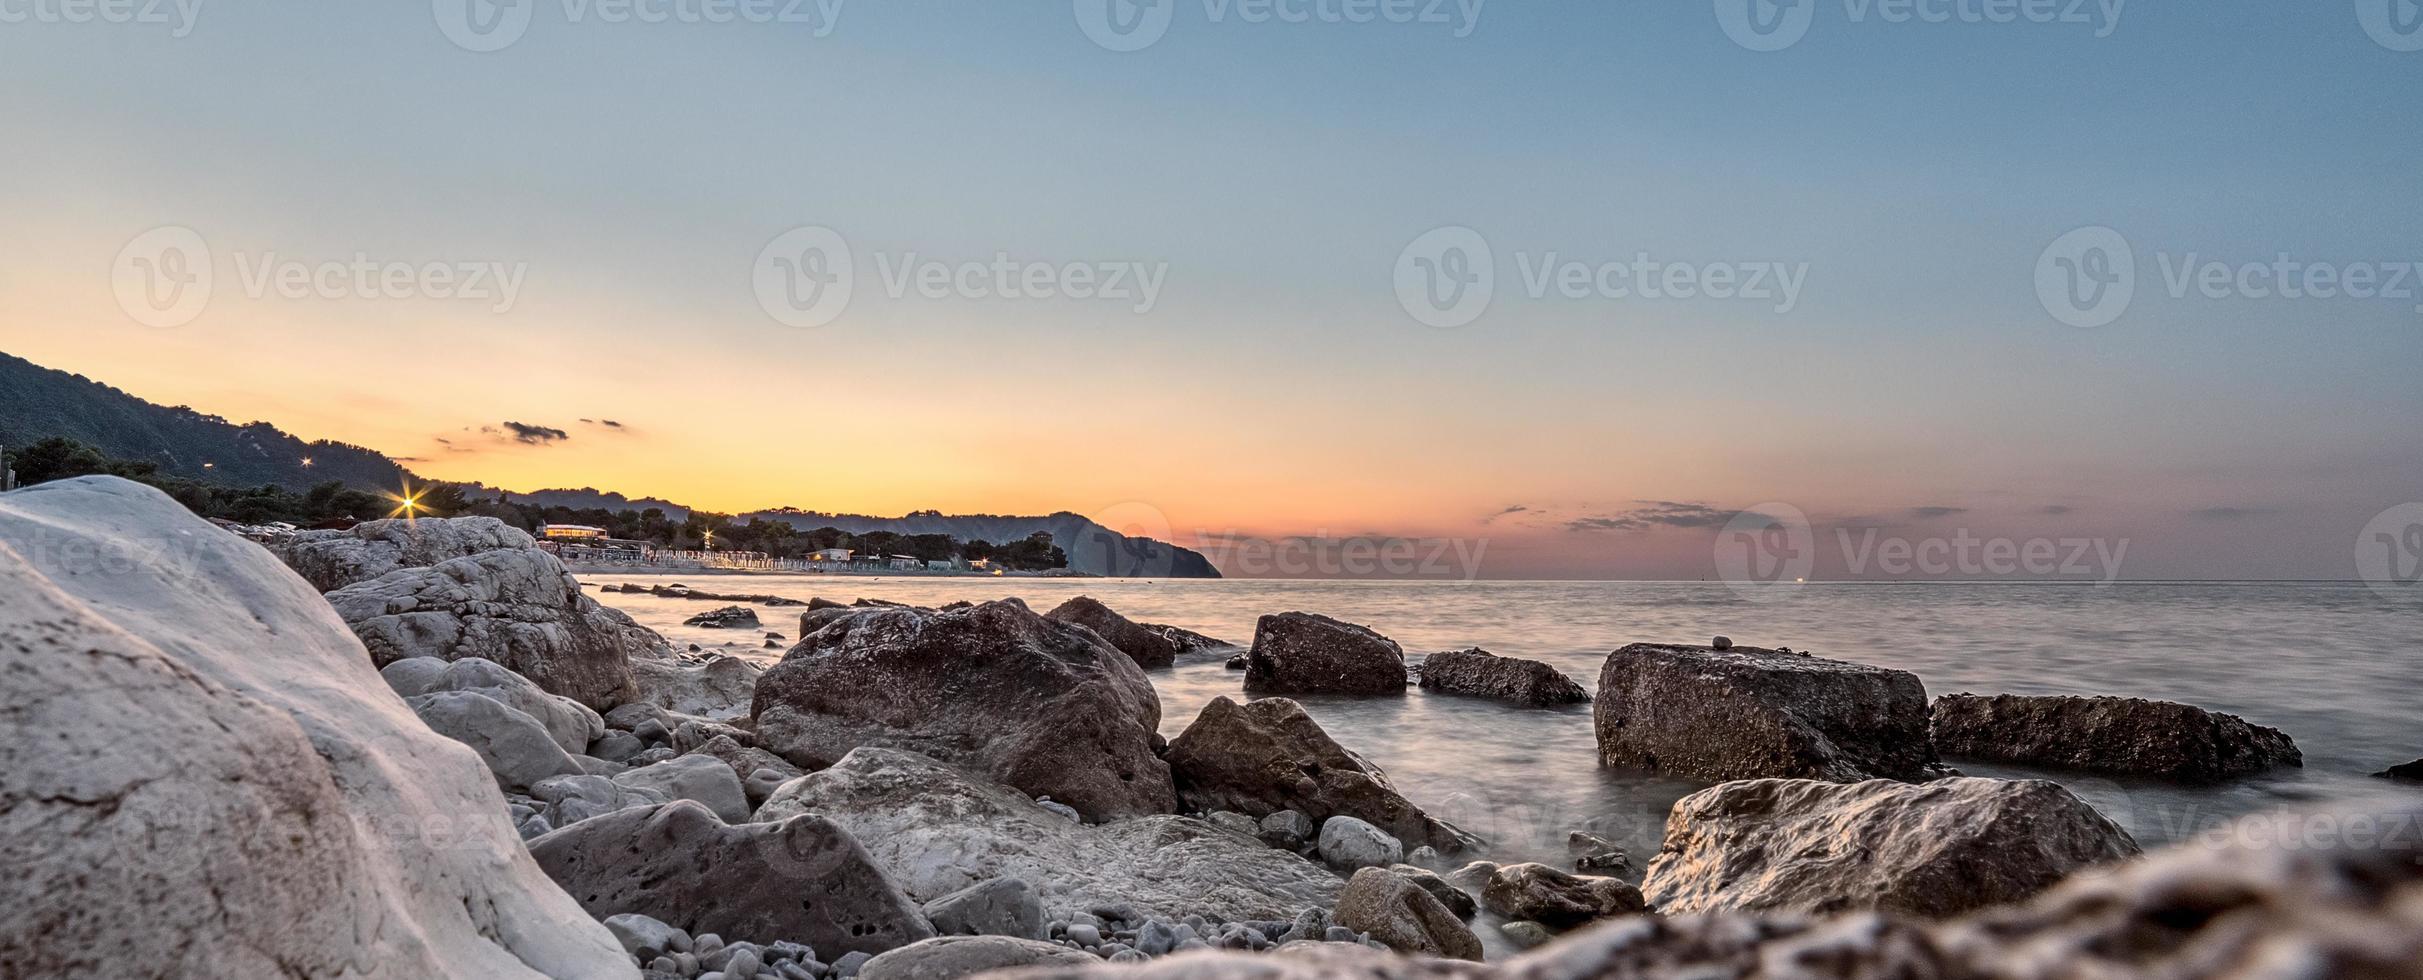 Sunset over sea and rocks. photo